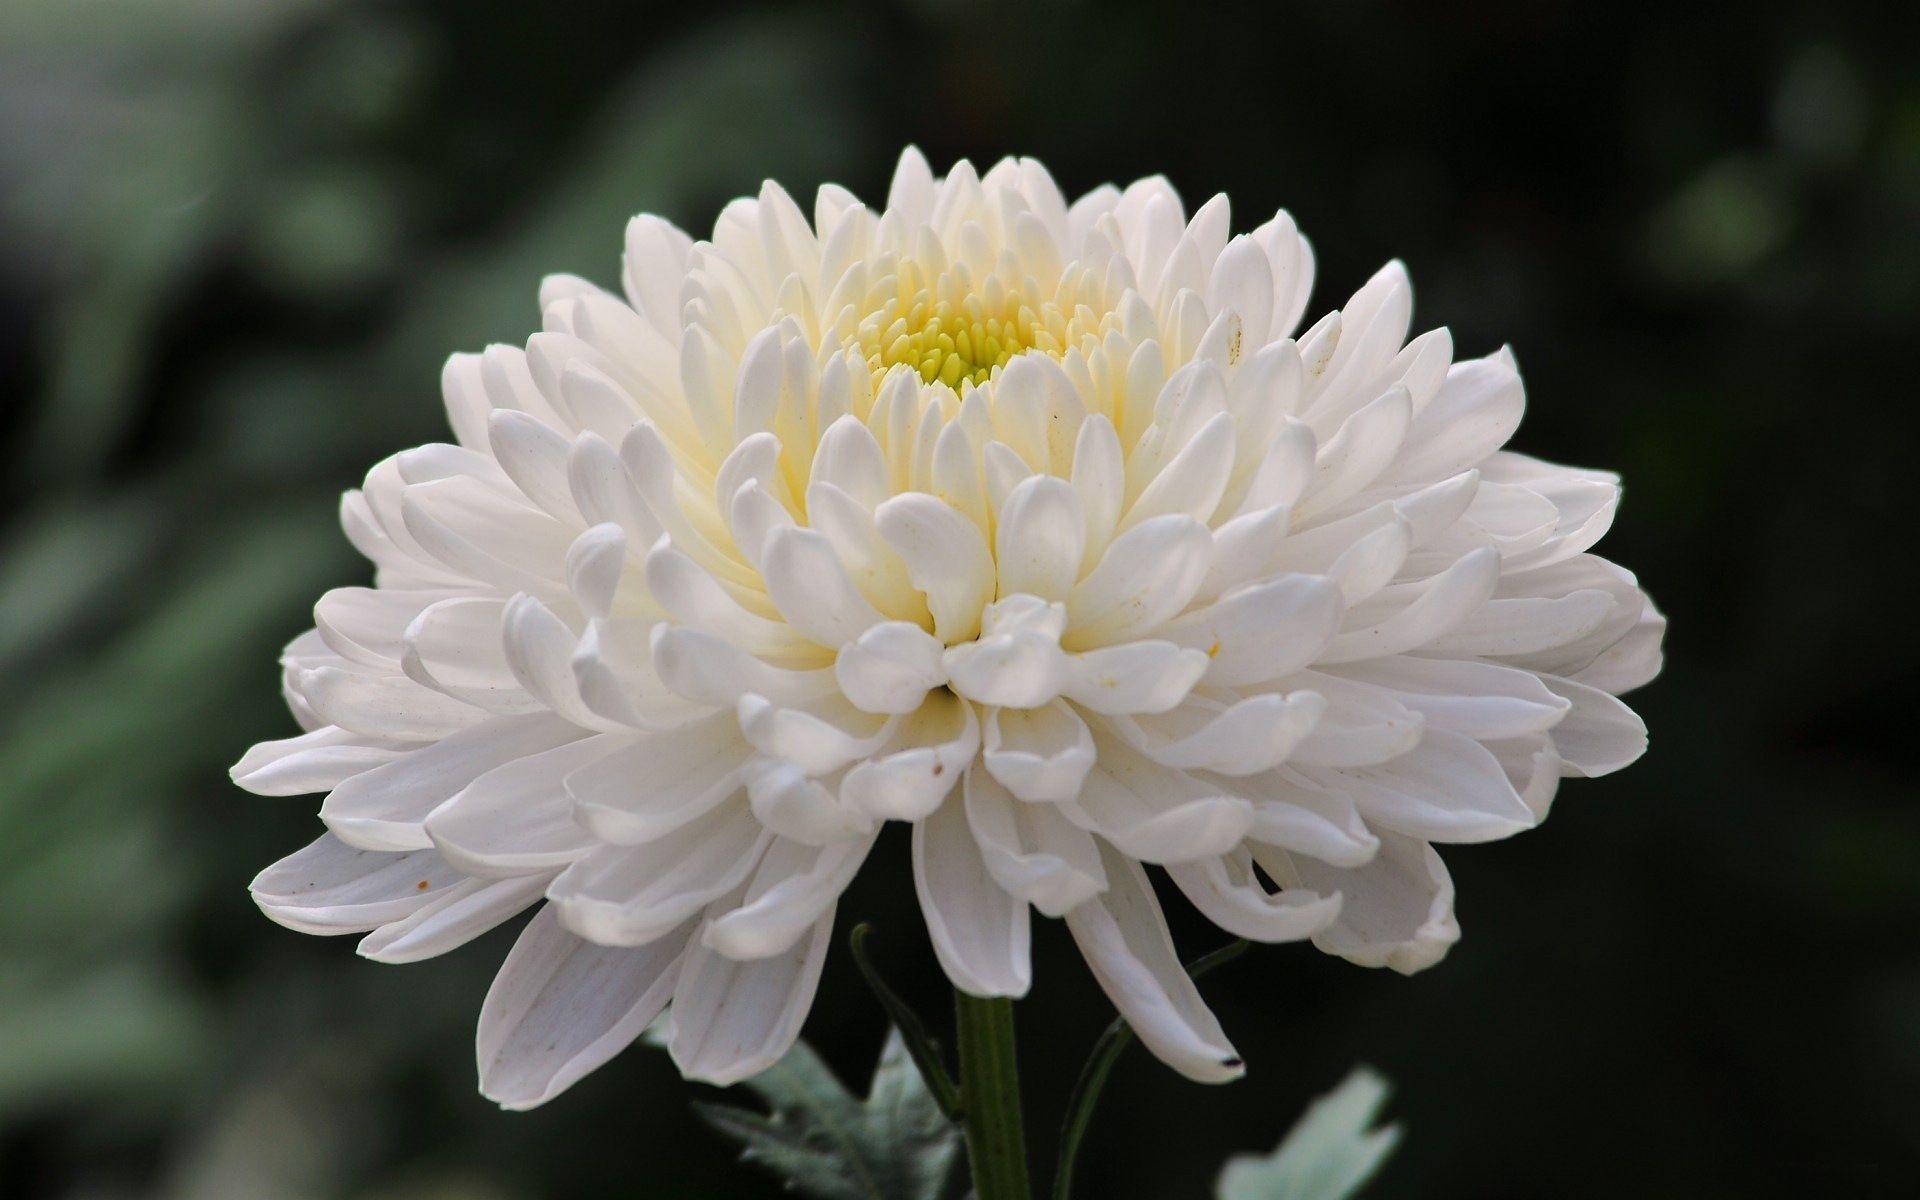 Beautiful Chrysanthemum Flower Hd Wallpaper Chrysanthemum Hd Wallpaper For Desktop Flowers Wallpapers Chrysanthemum Flower White Chrysanthemum Flower Close Up